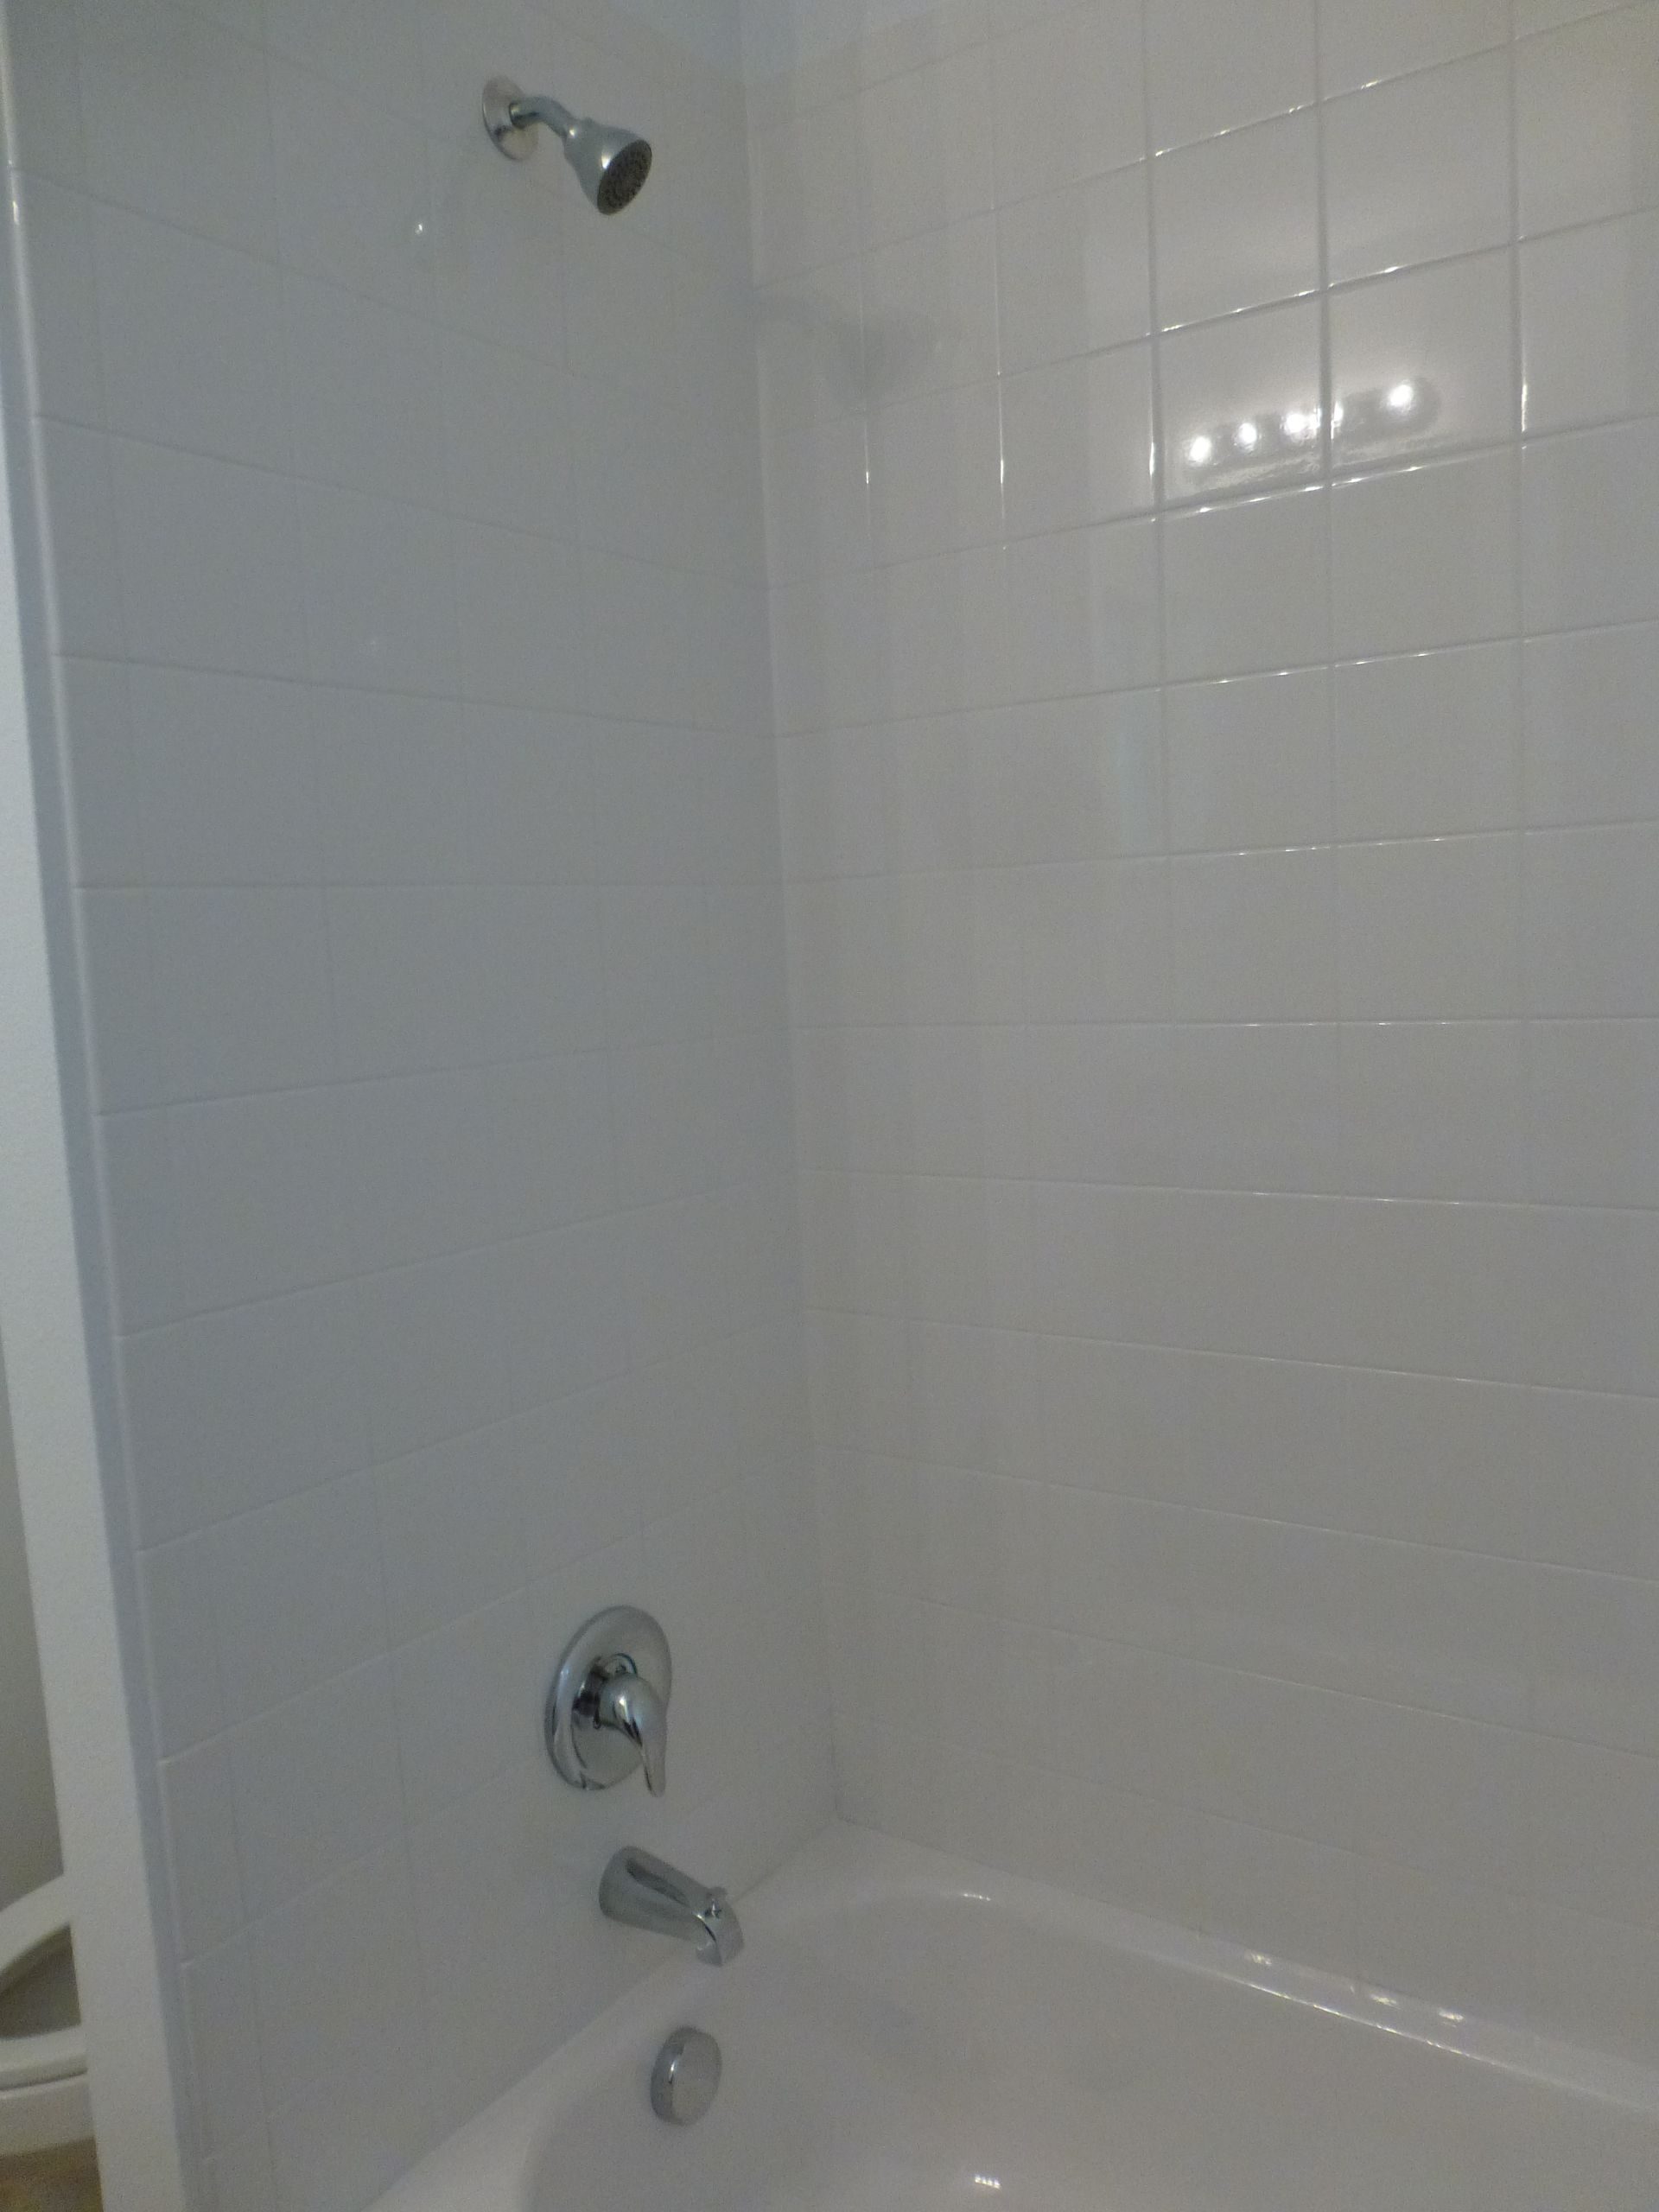 6x6 white bath wall tile standard in